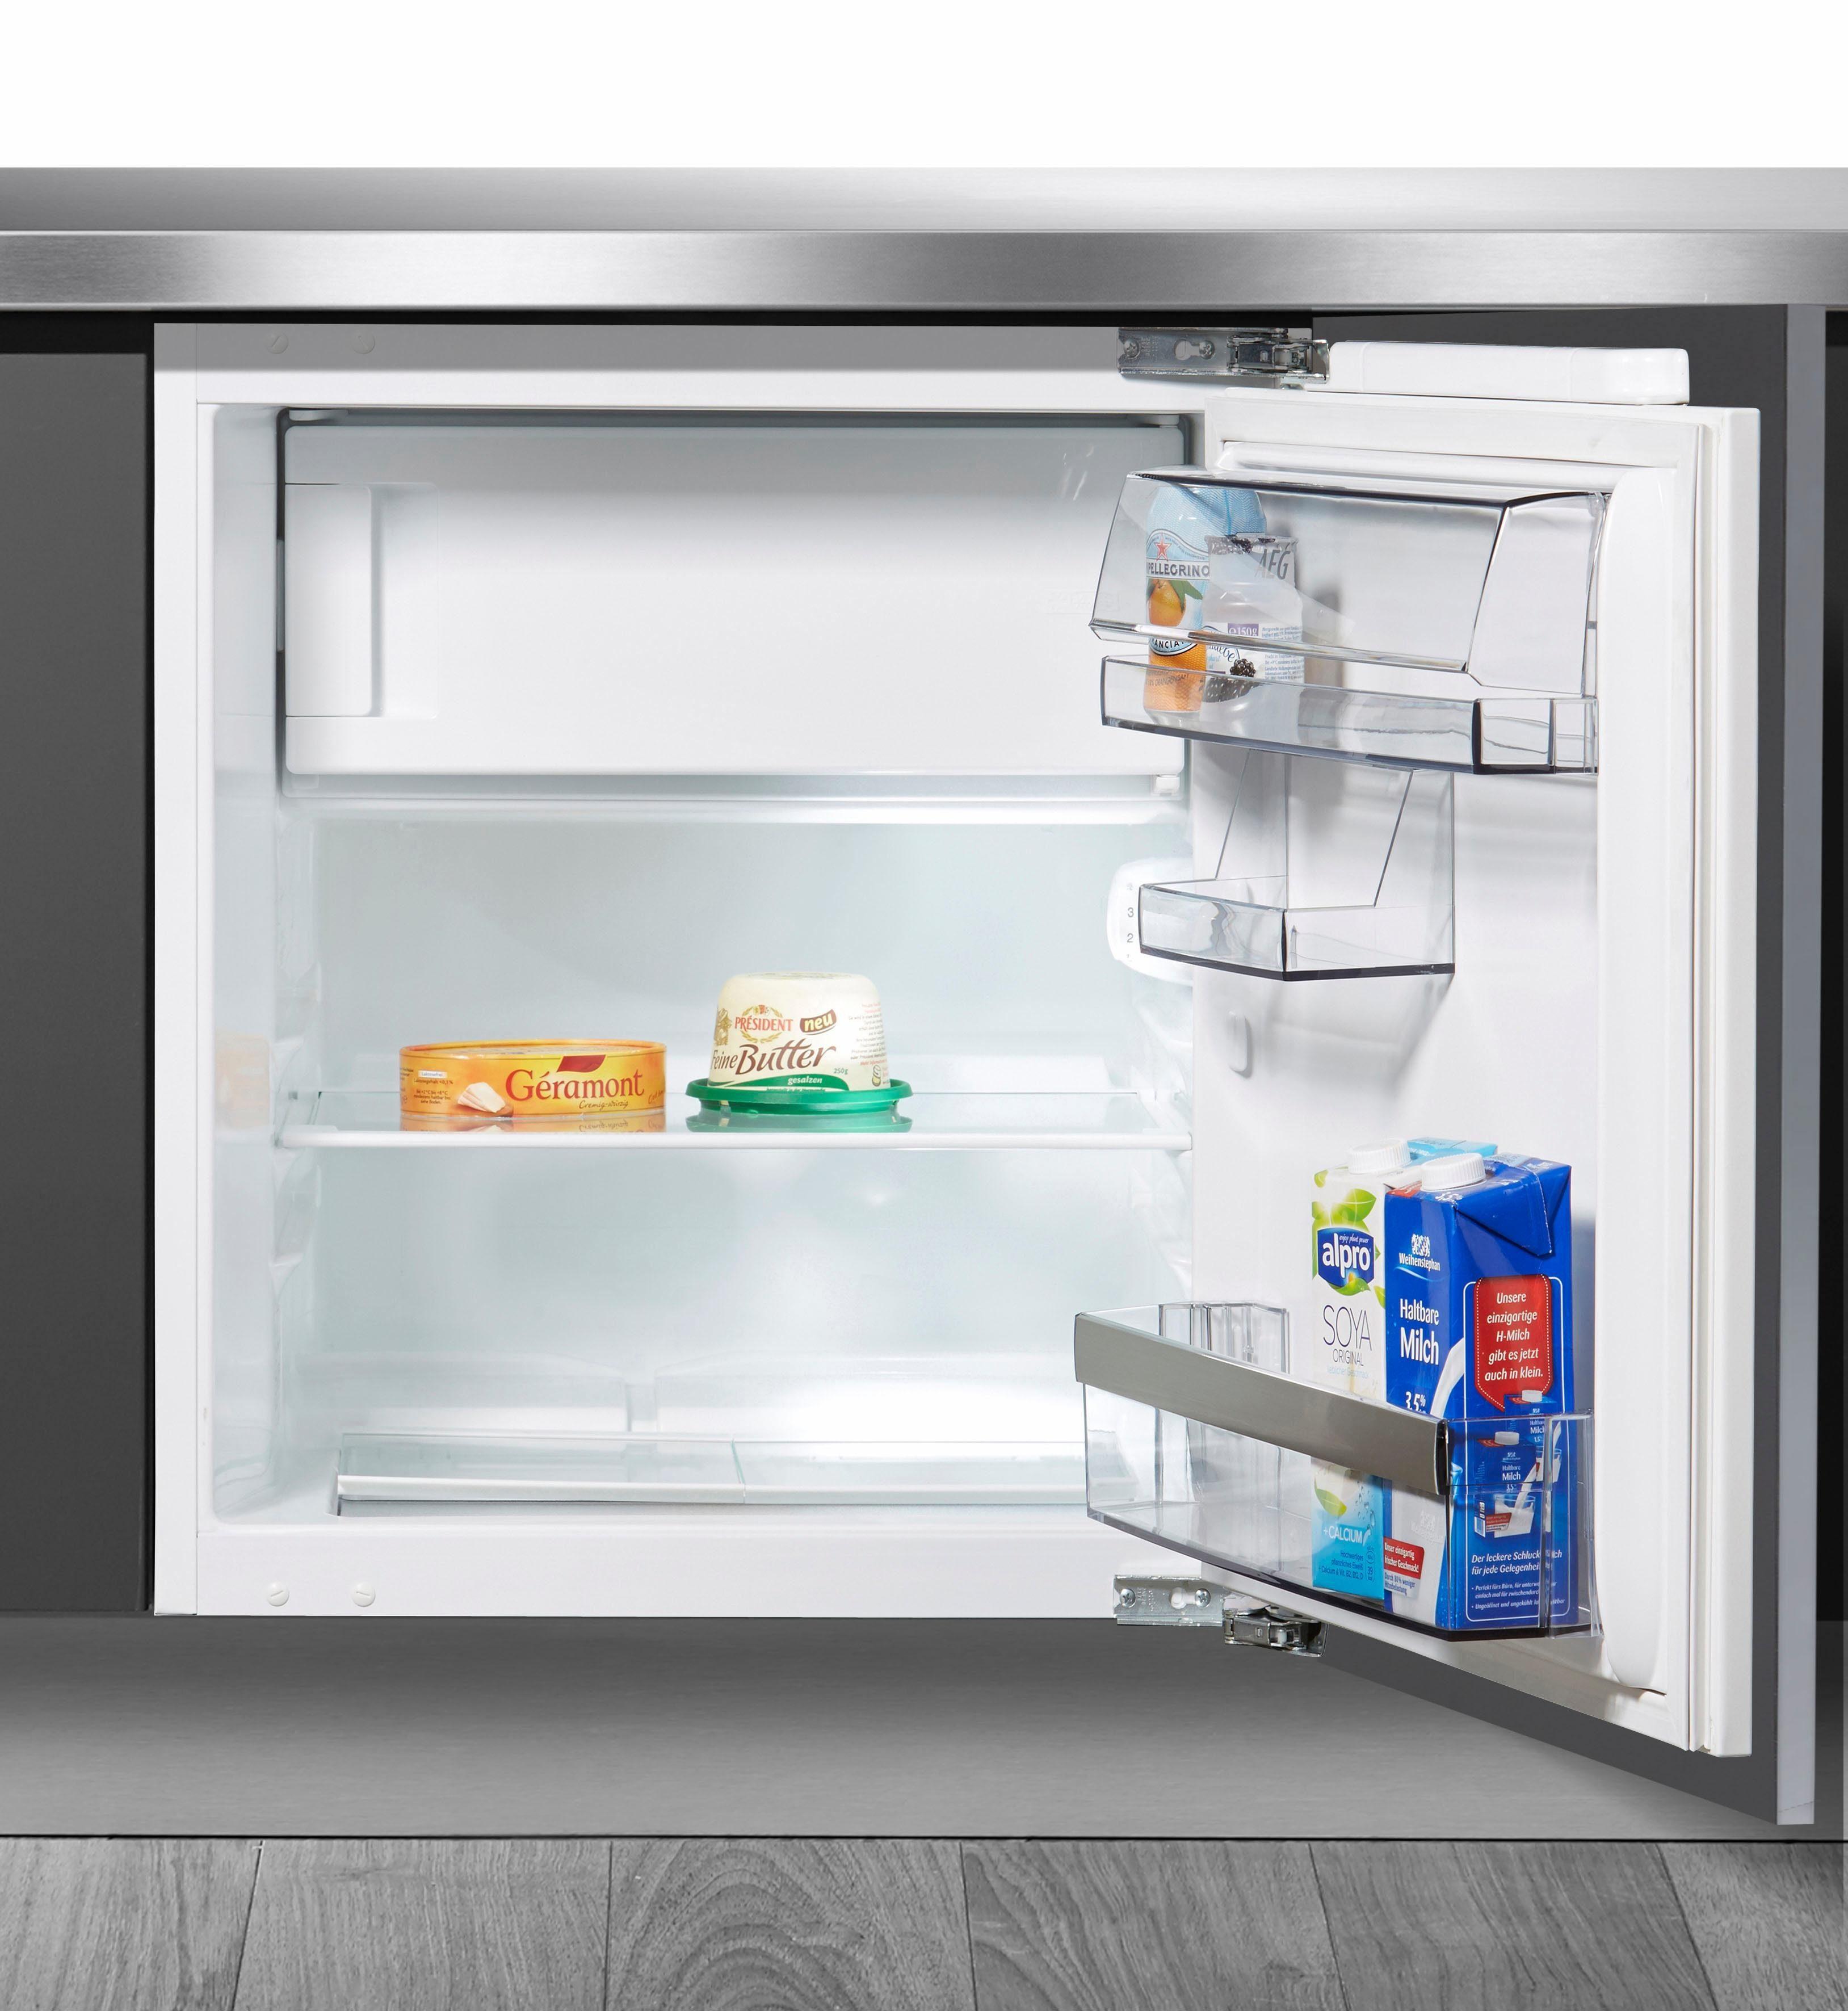 AEG Einbaukühlschrank SANTO SFB58221AF, 81,5 cm hoch, 59,6 cm breit, Energieklasse A++, 81,5 cm hoch, integrierbar